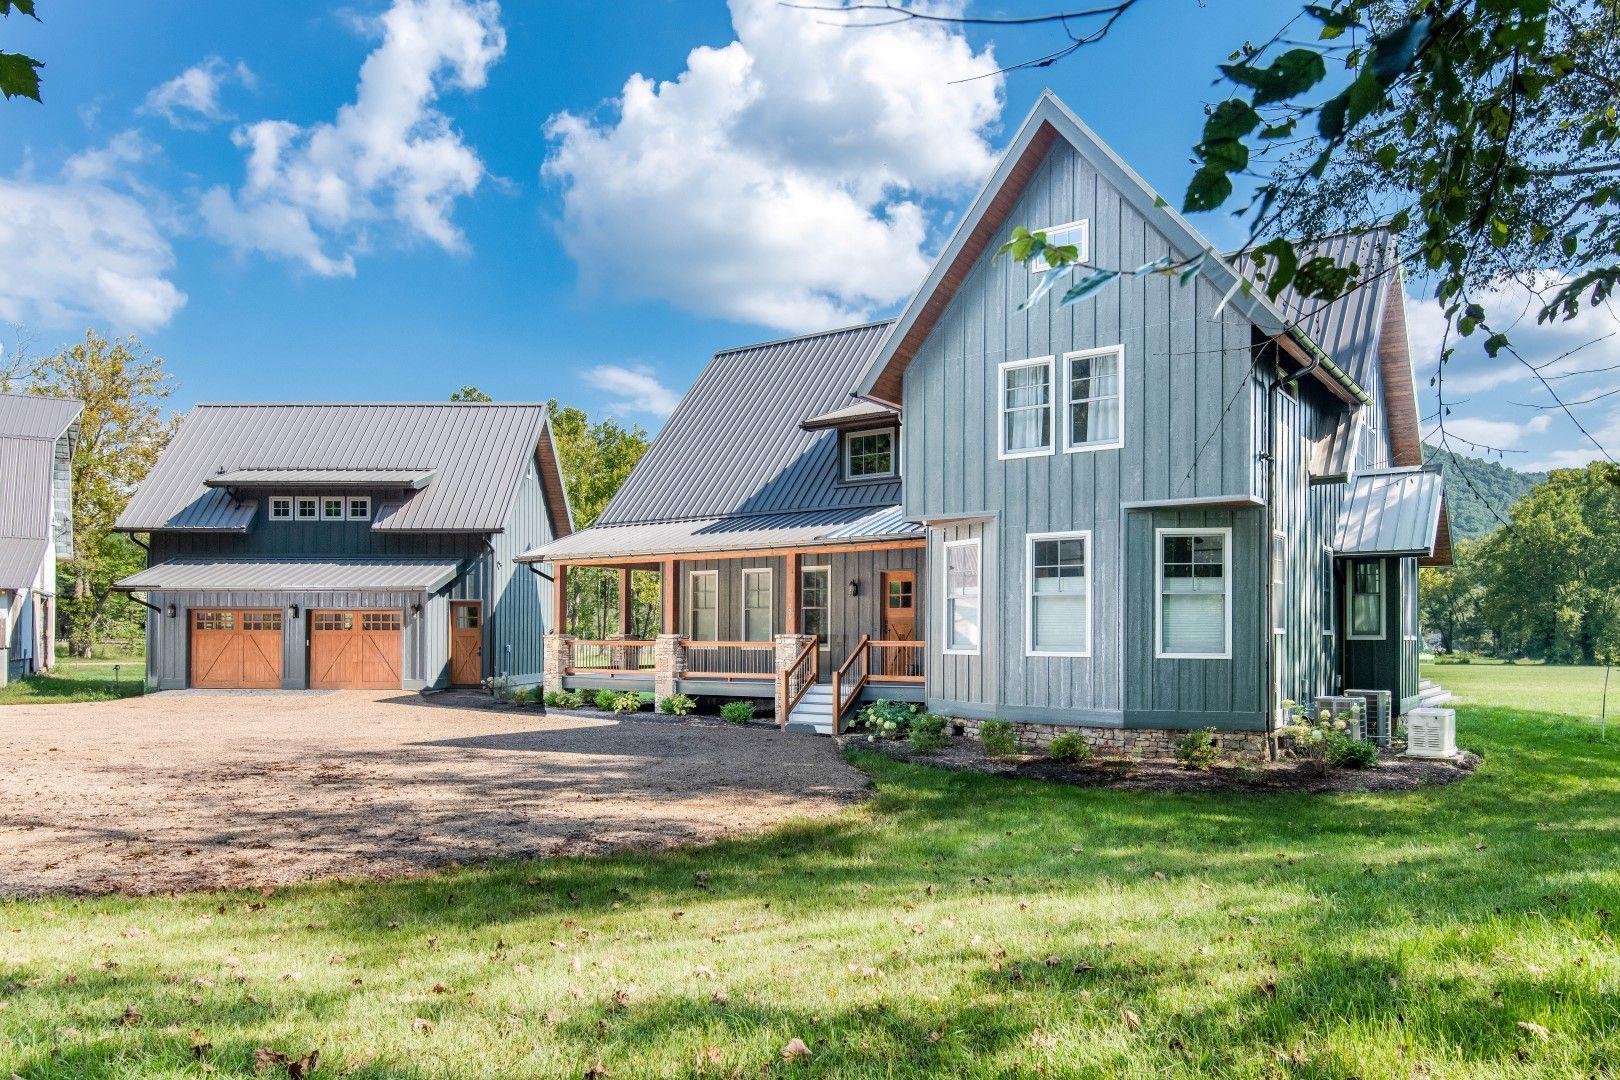 Modern Farmhouse built by Judd Builders near Asheville, NC